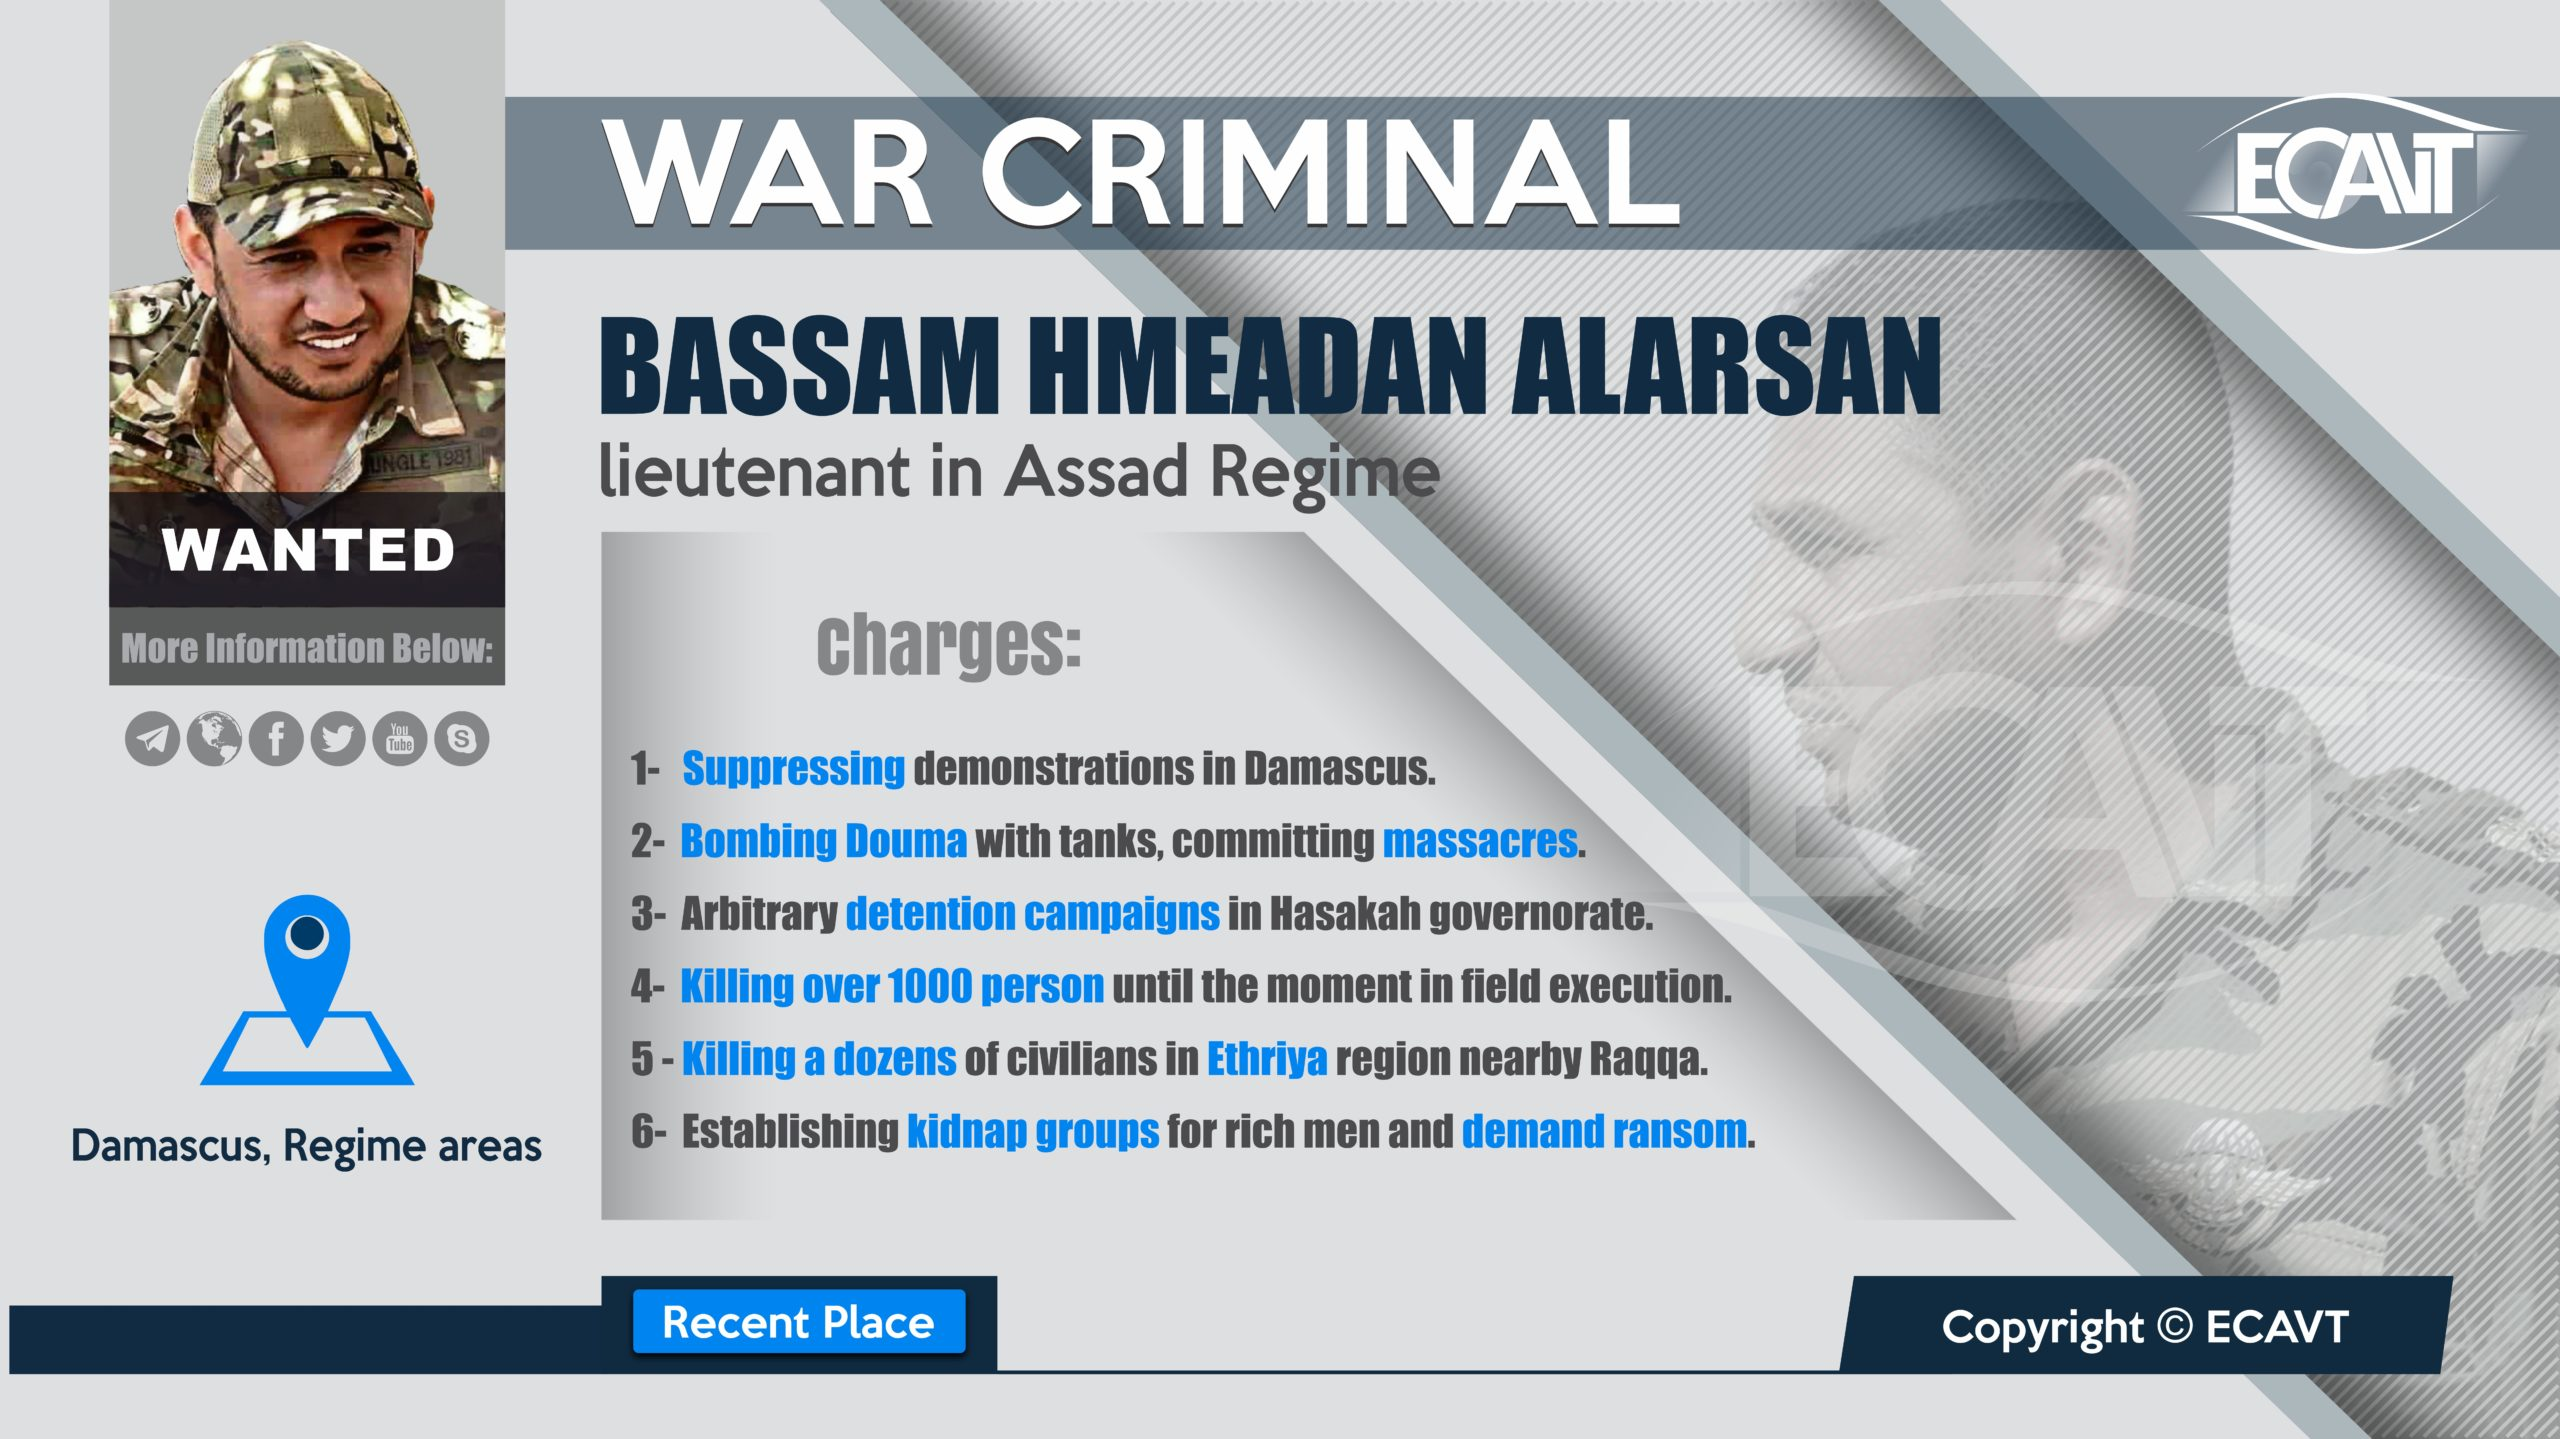 بسام  حميدان العرسان